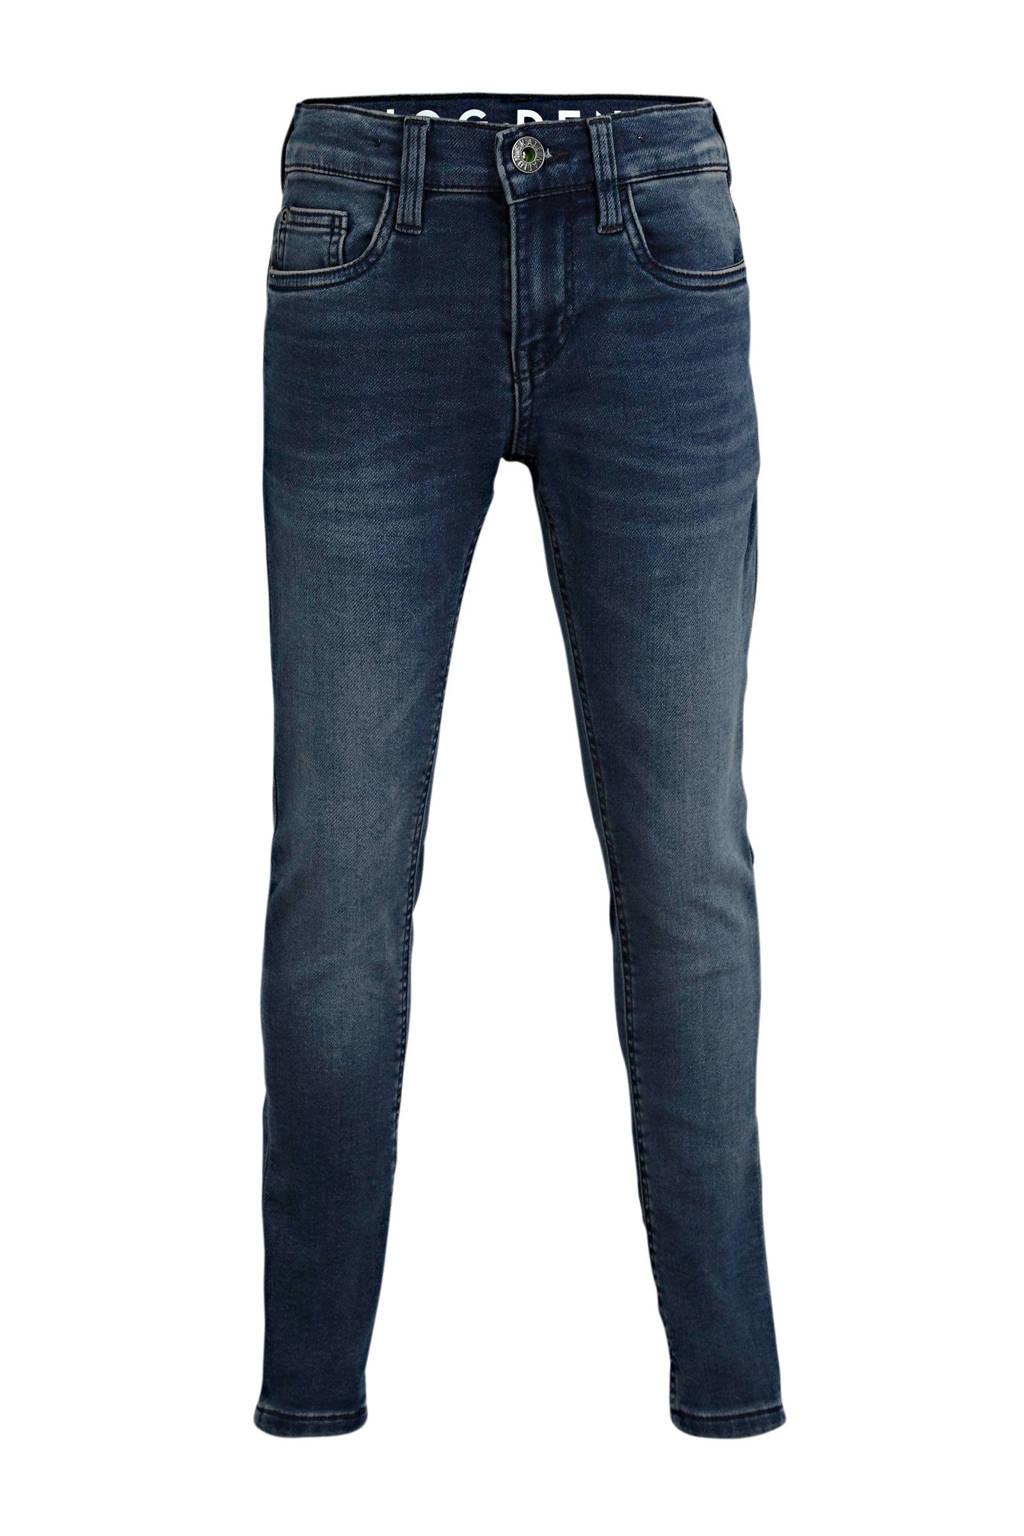 C&A The Denim slim fit jeans dark denim, Dark denim